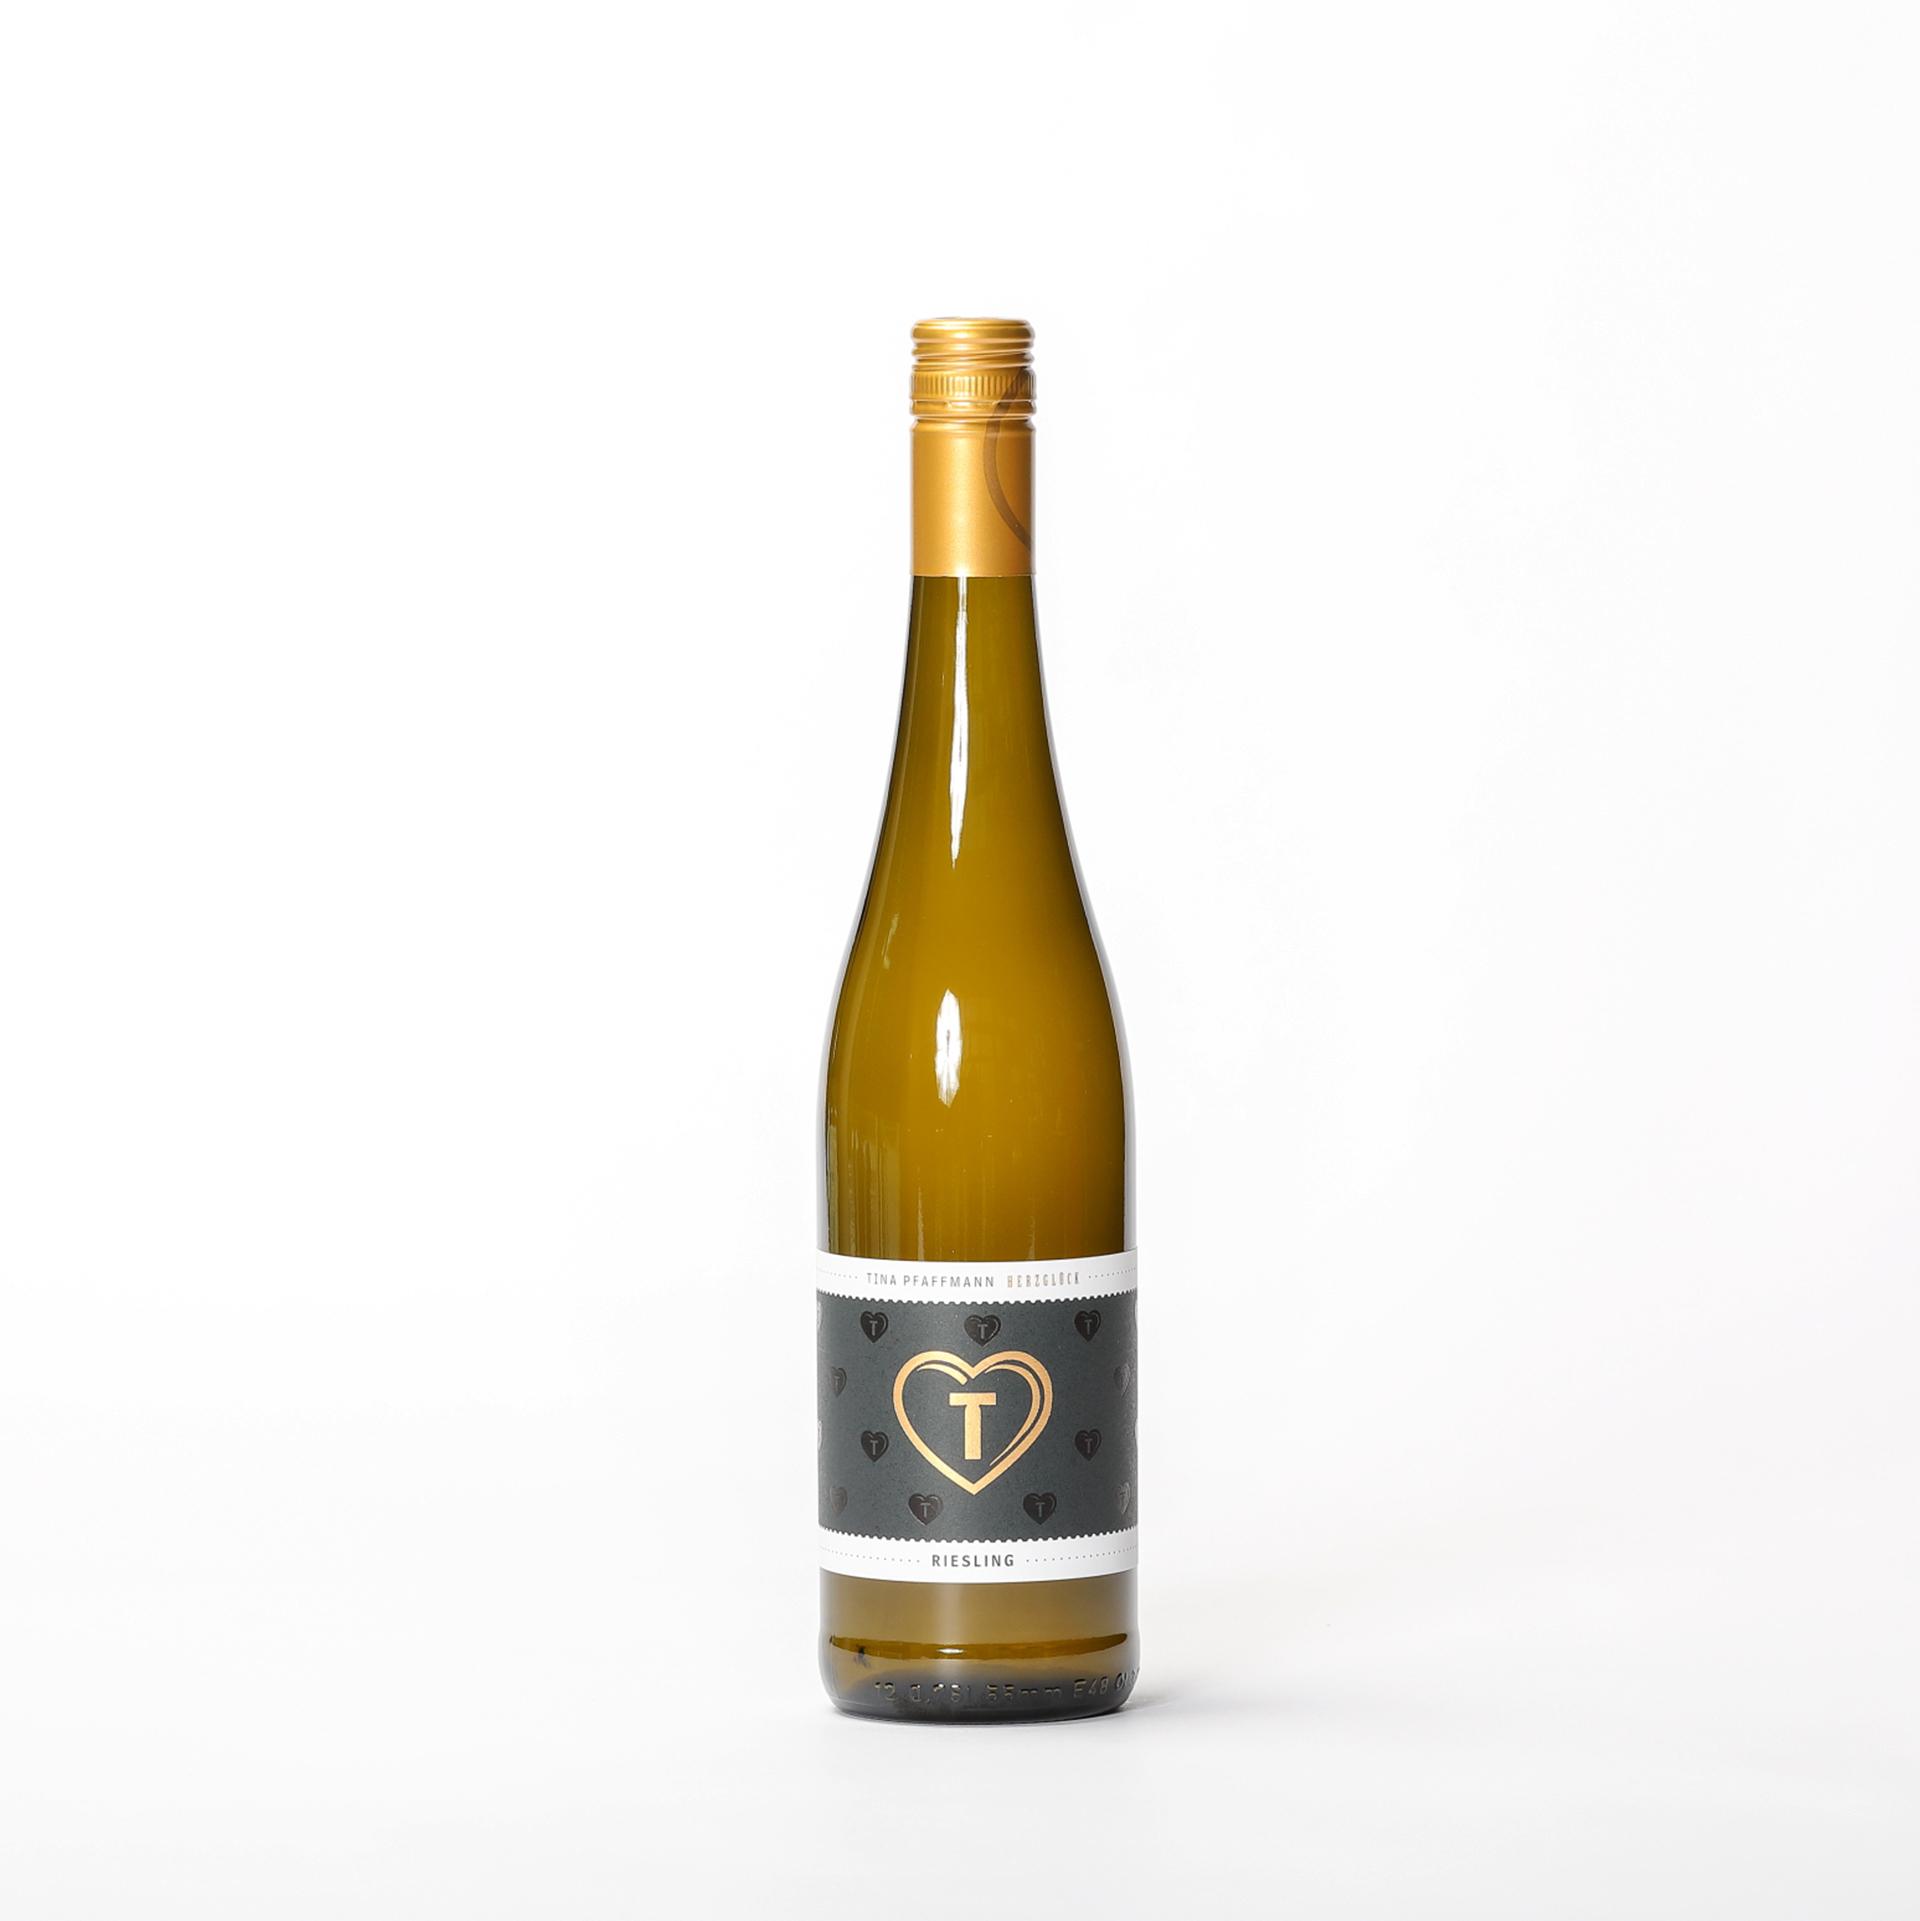 Herzglück Riesling 2019 - Weingut Pfaffmann